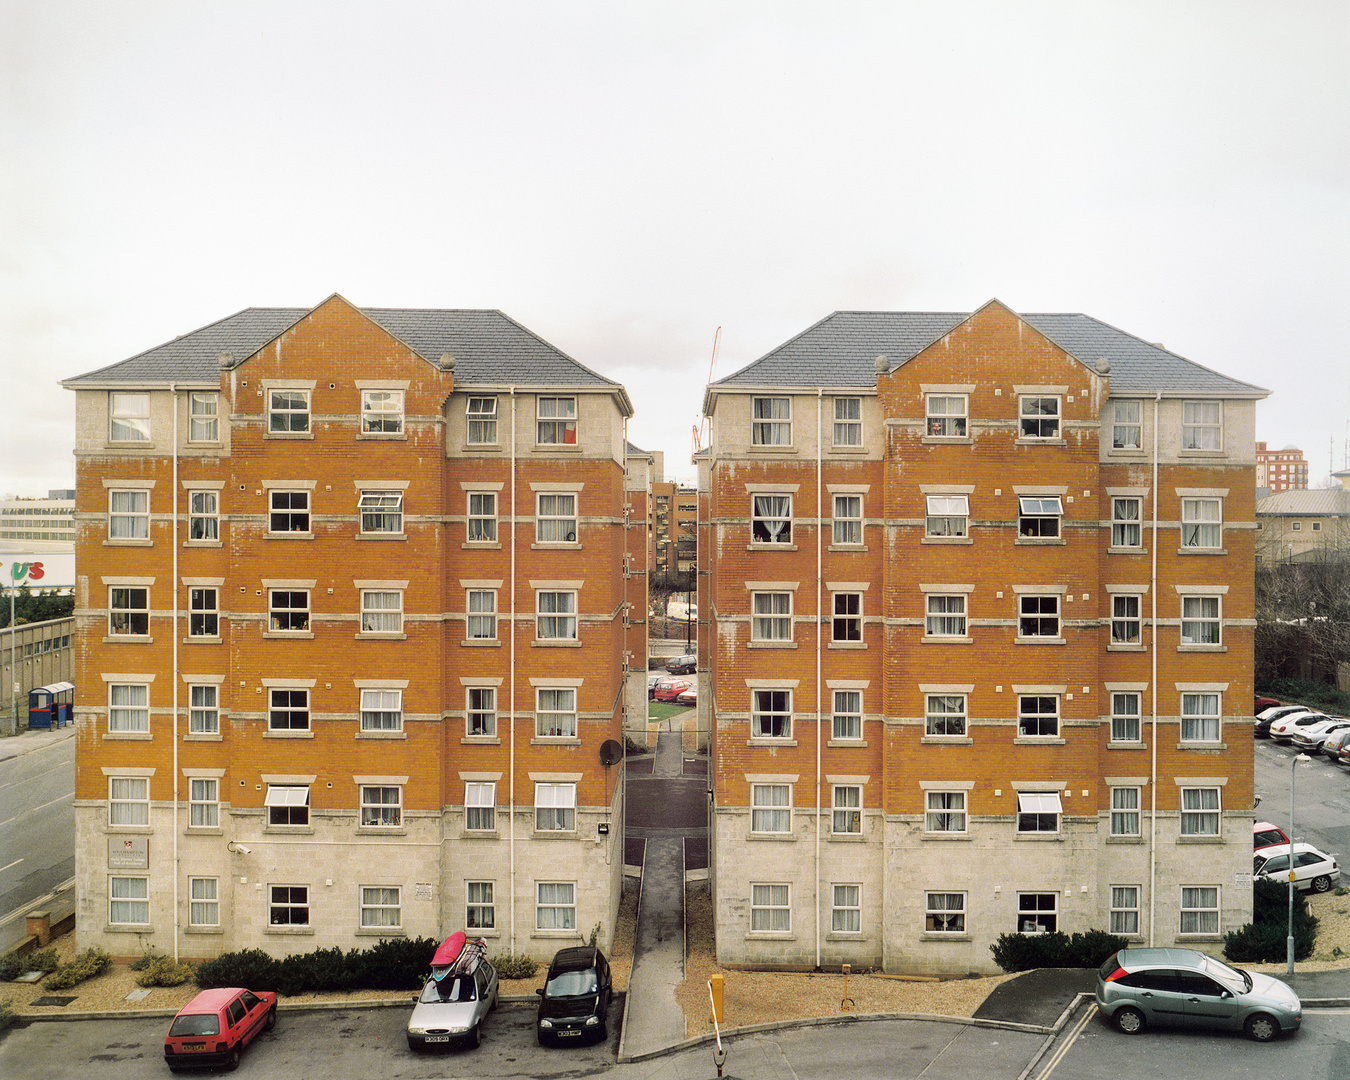 Student hostel, Southampton